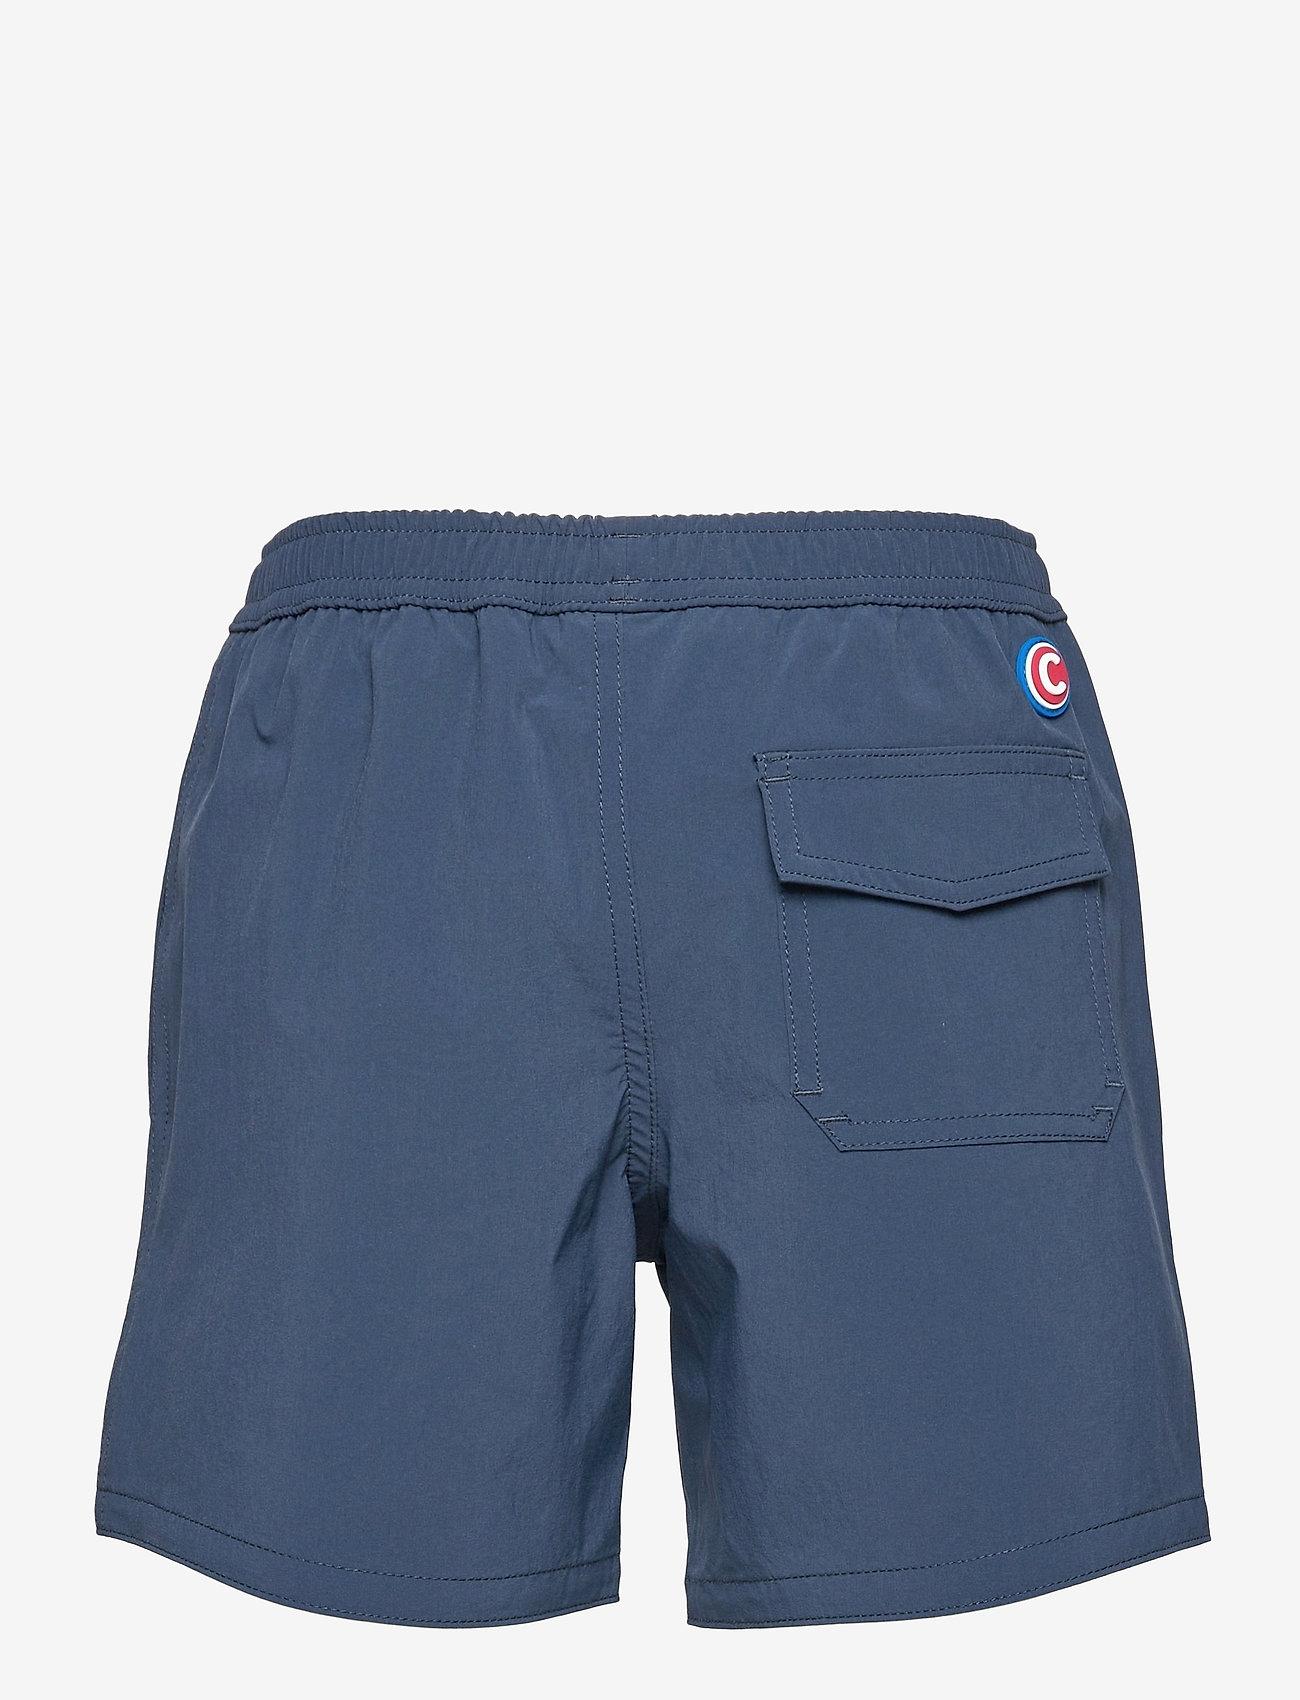 Colmar - JR.SWIM.SHORTS - badehosen - navy blue - 1